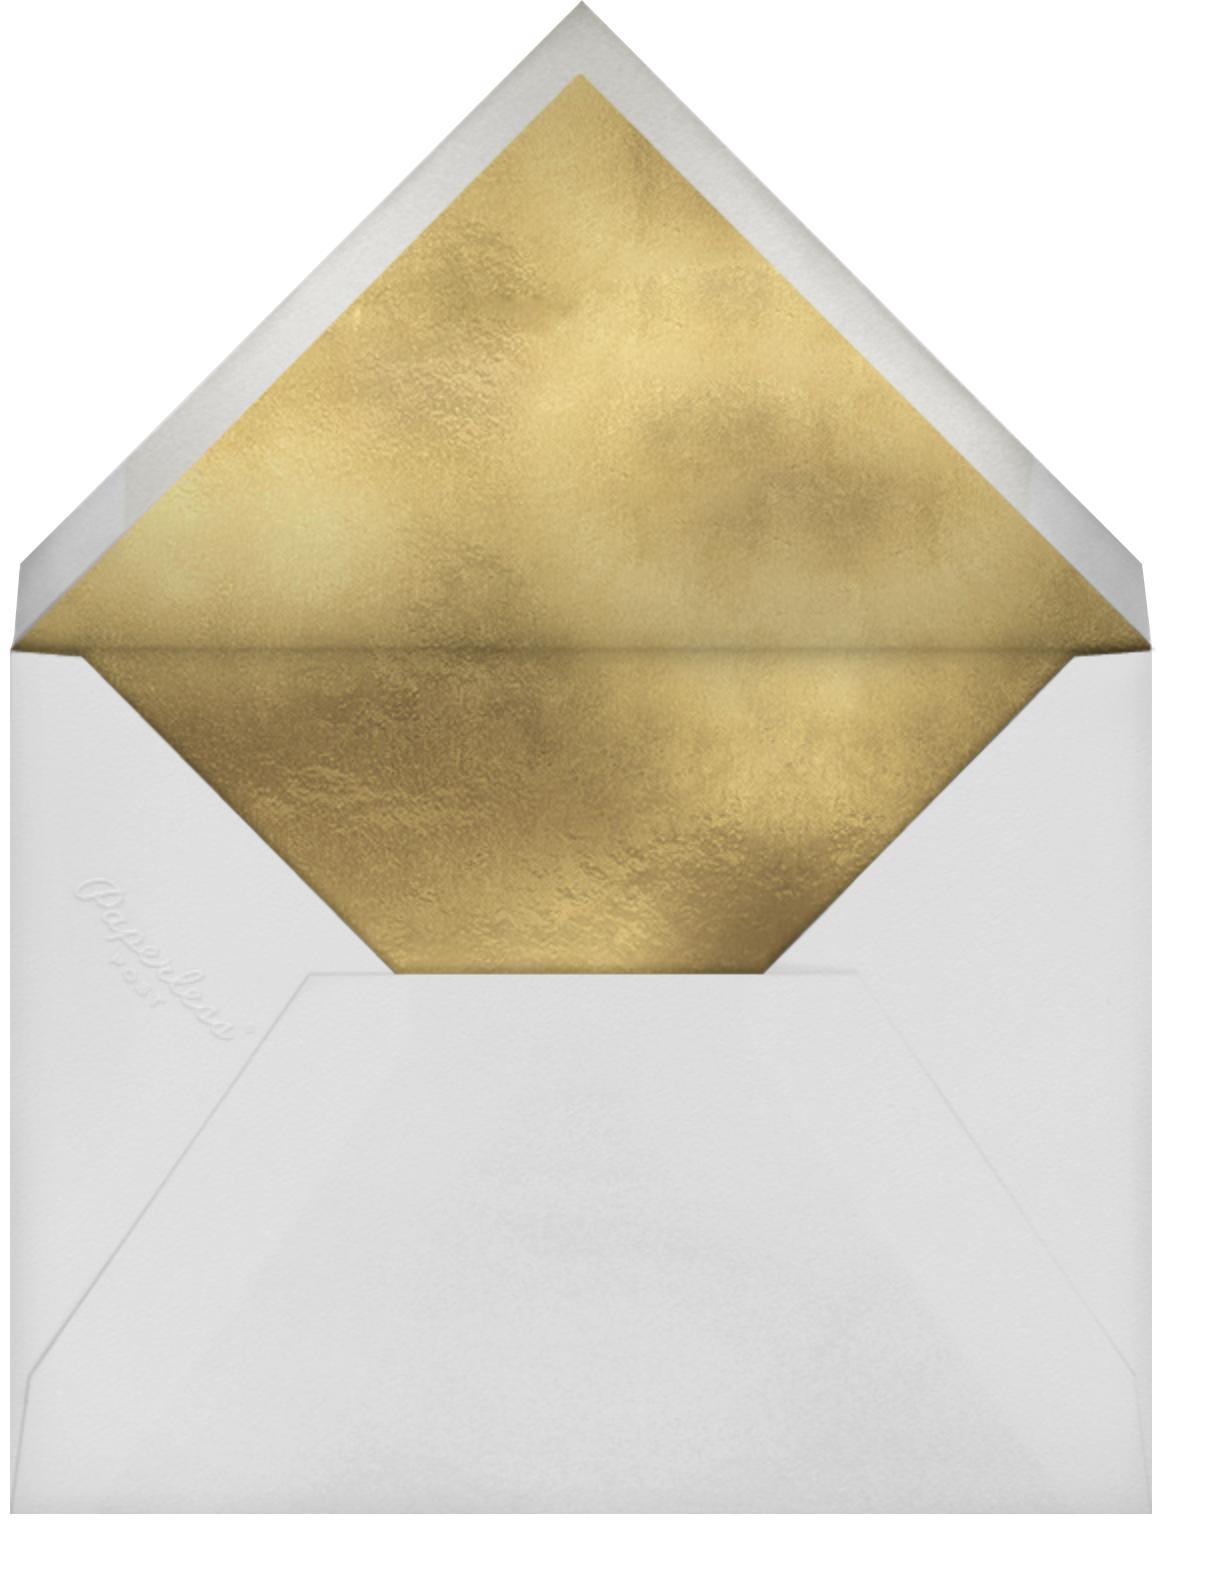 Golden Smiles  - Linda and Harriett - Happy hour - envelope back